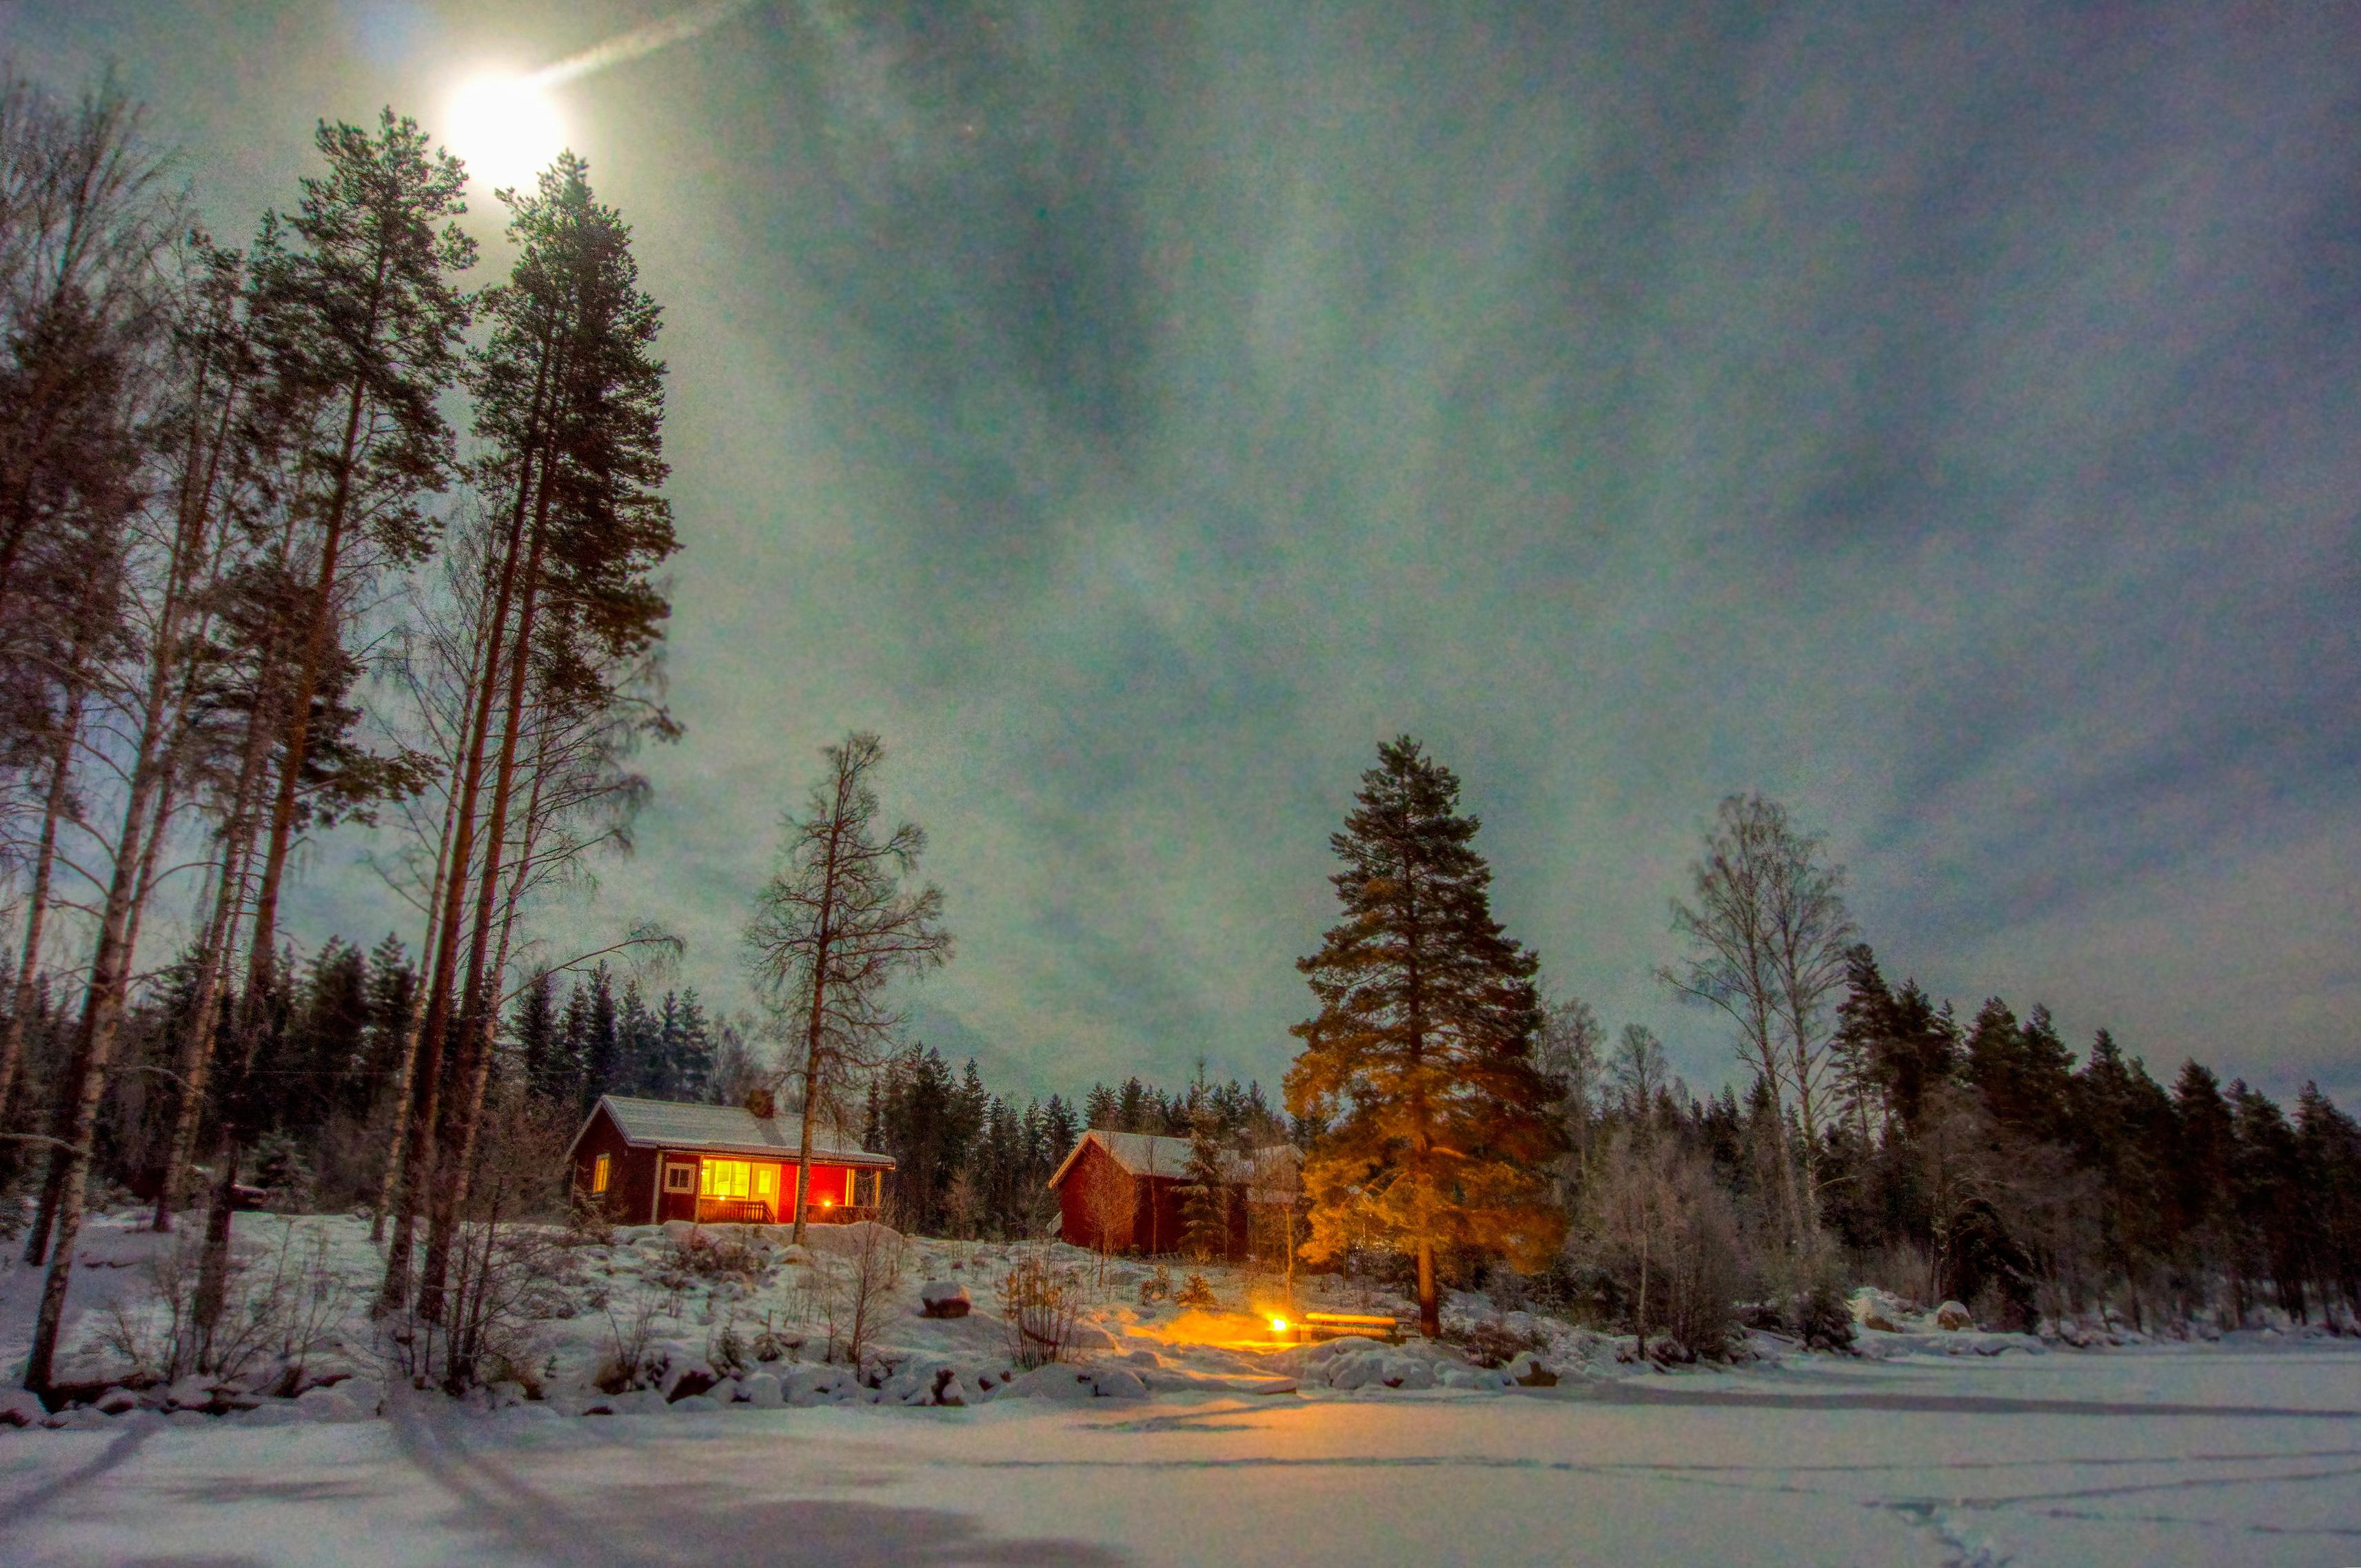 Nordre Borthuskoia Foto: Torkel Skoglund